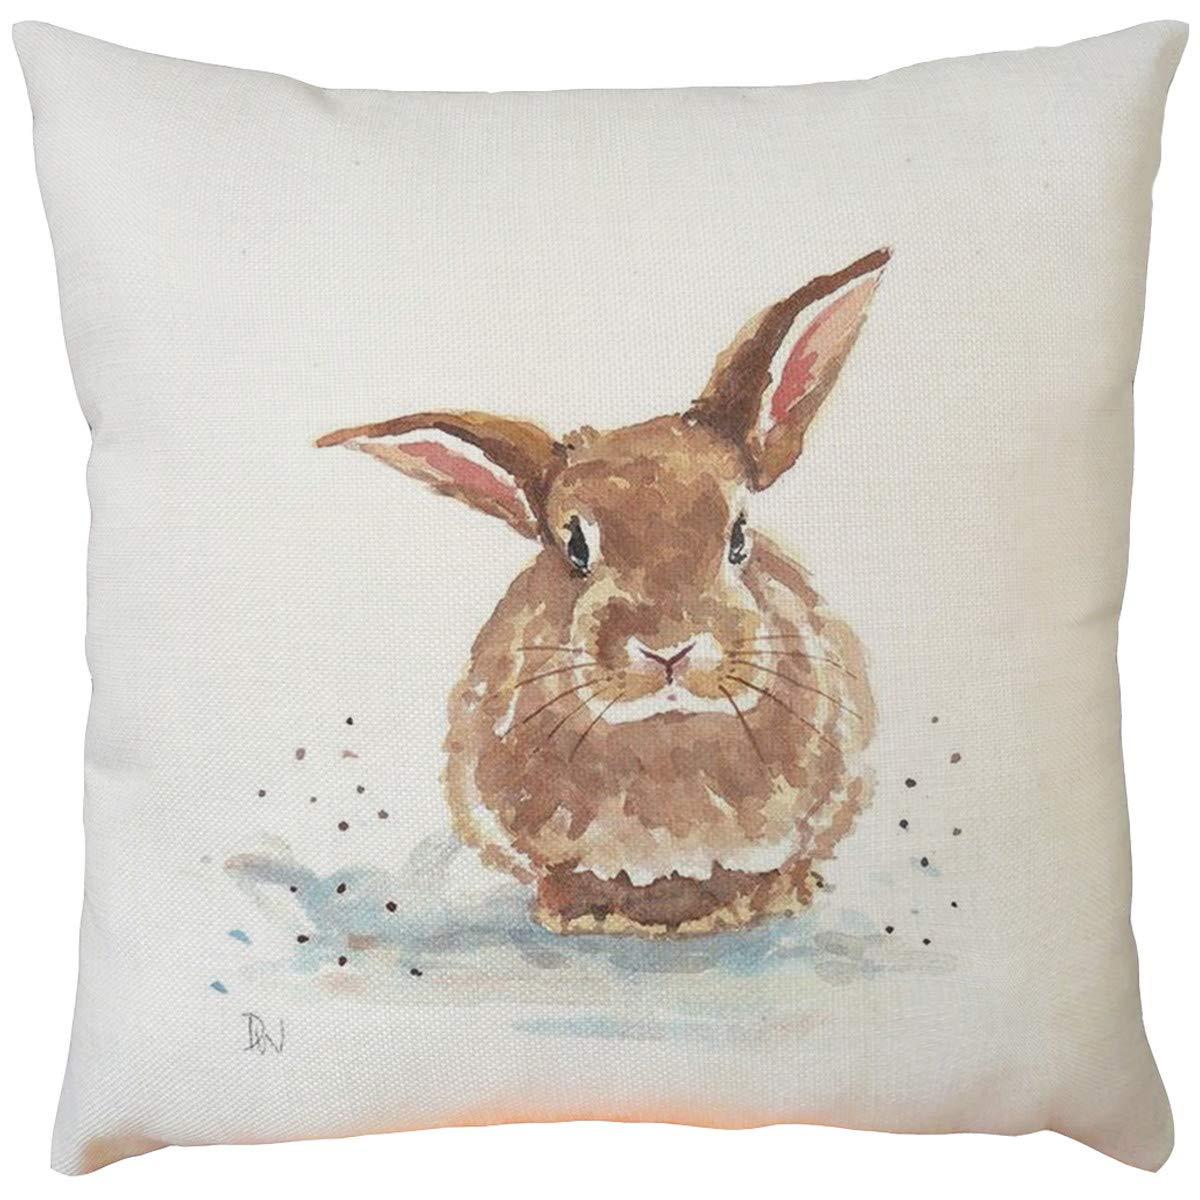 Pillow Covers 18x18 Home Decor Cushion Cover Easter Festival Series Rabbit Throw Pillowcase Pillow Covers,Rabbit Pillowcase Home Decoration Pillowcase Color F, Throw, Farmhouse Decorative Pillow Case